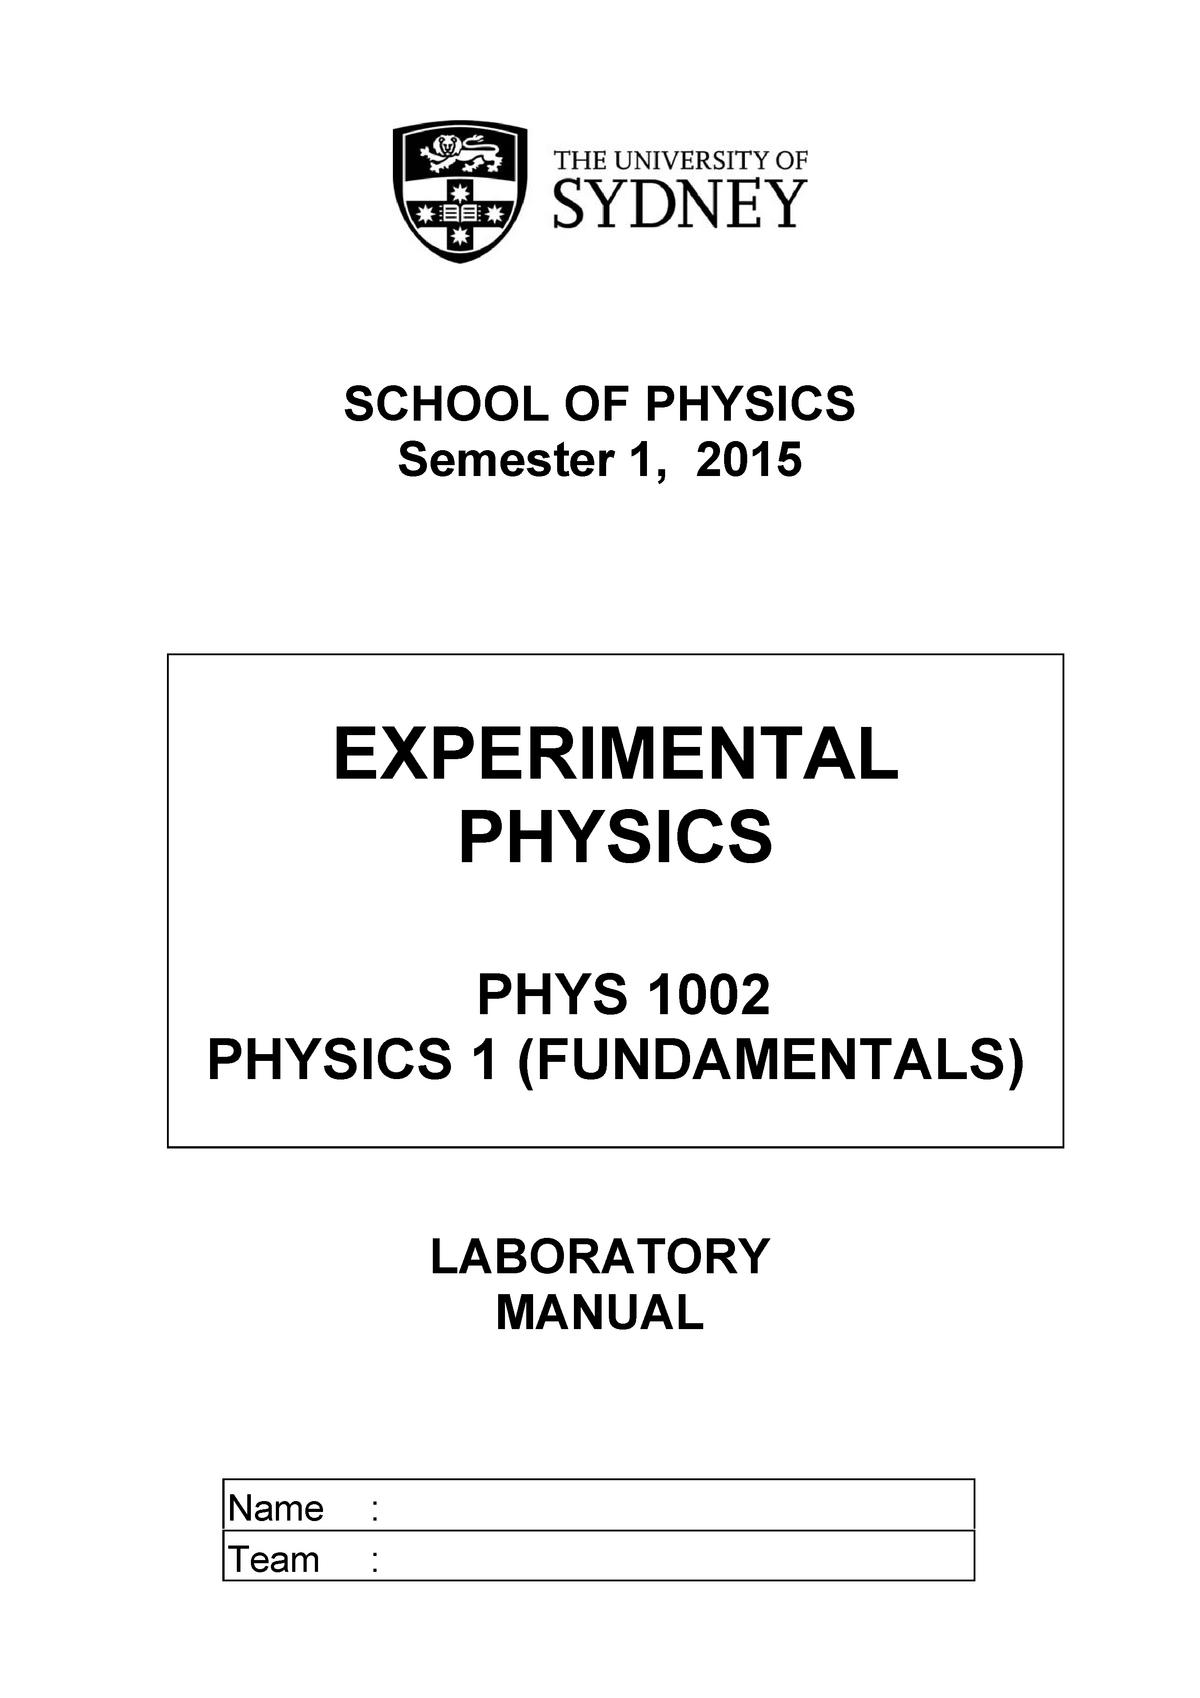 Practical - lab manual - PHYS1002 Physics 1 (Fundamentals